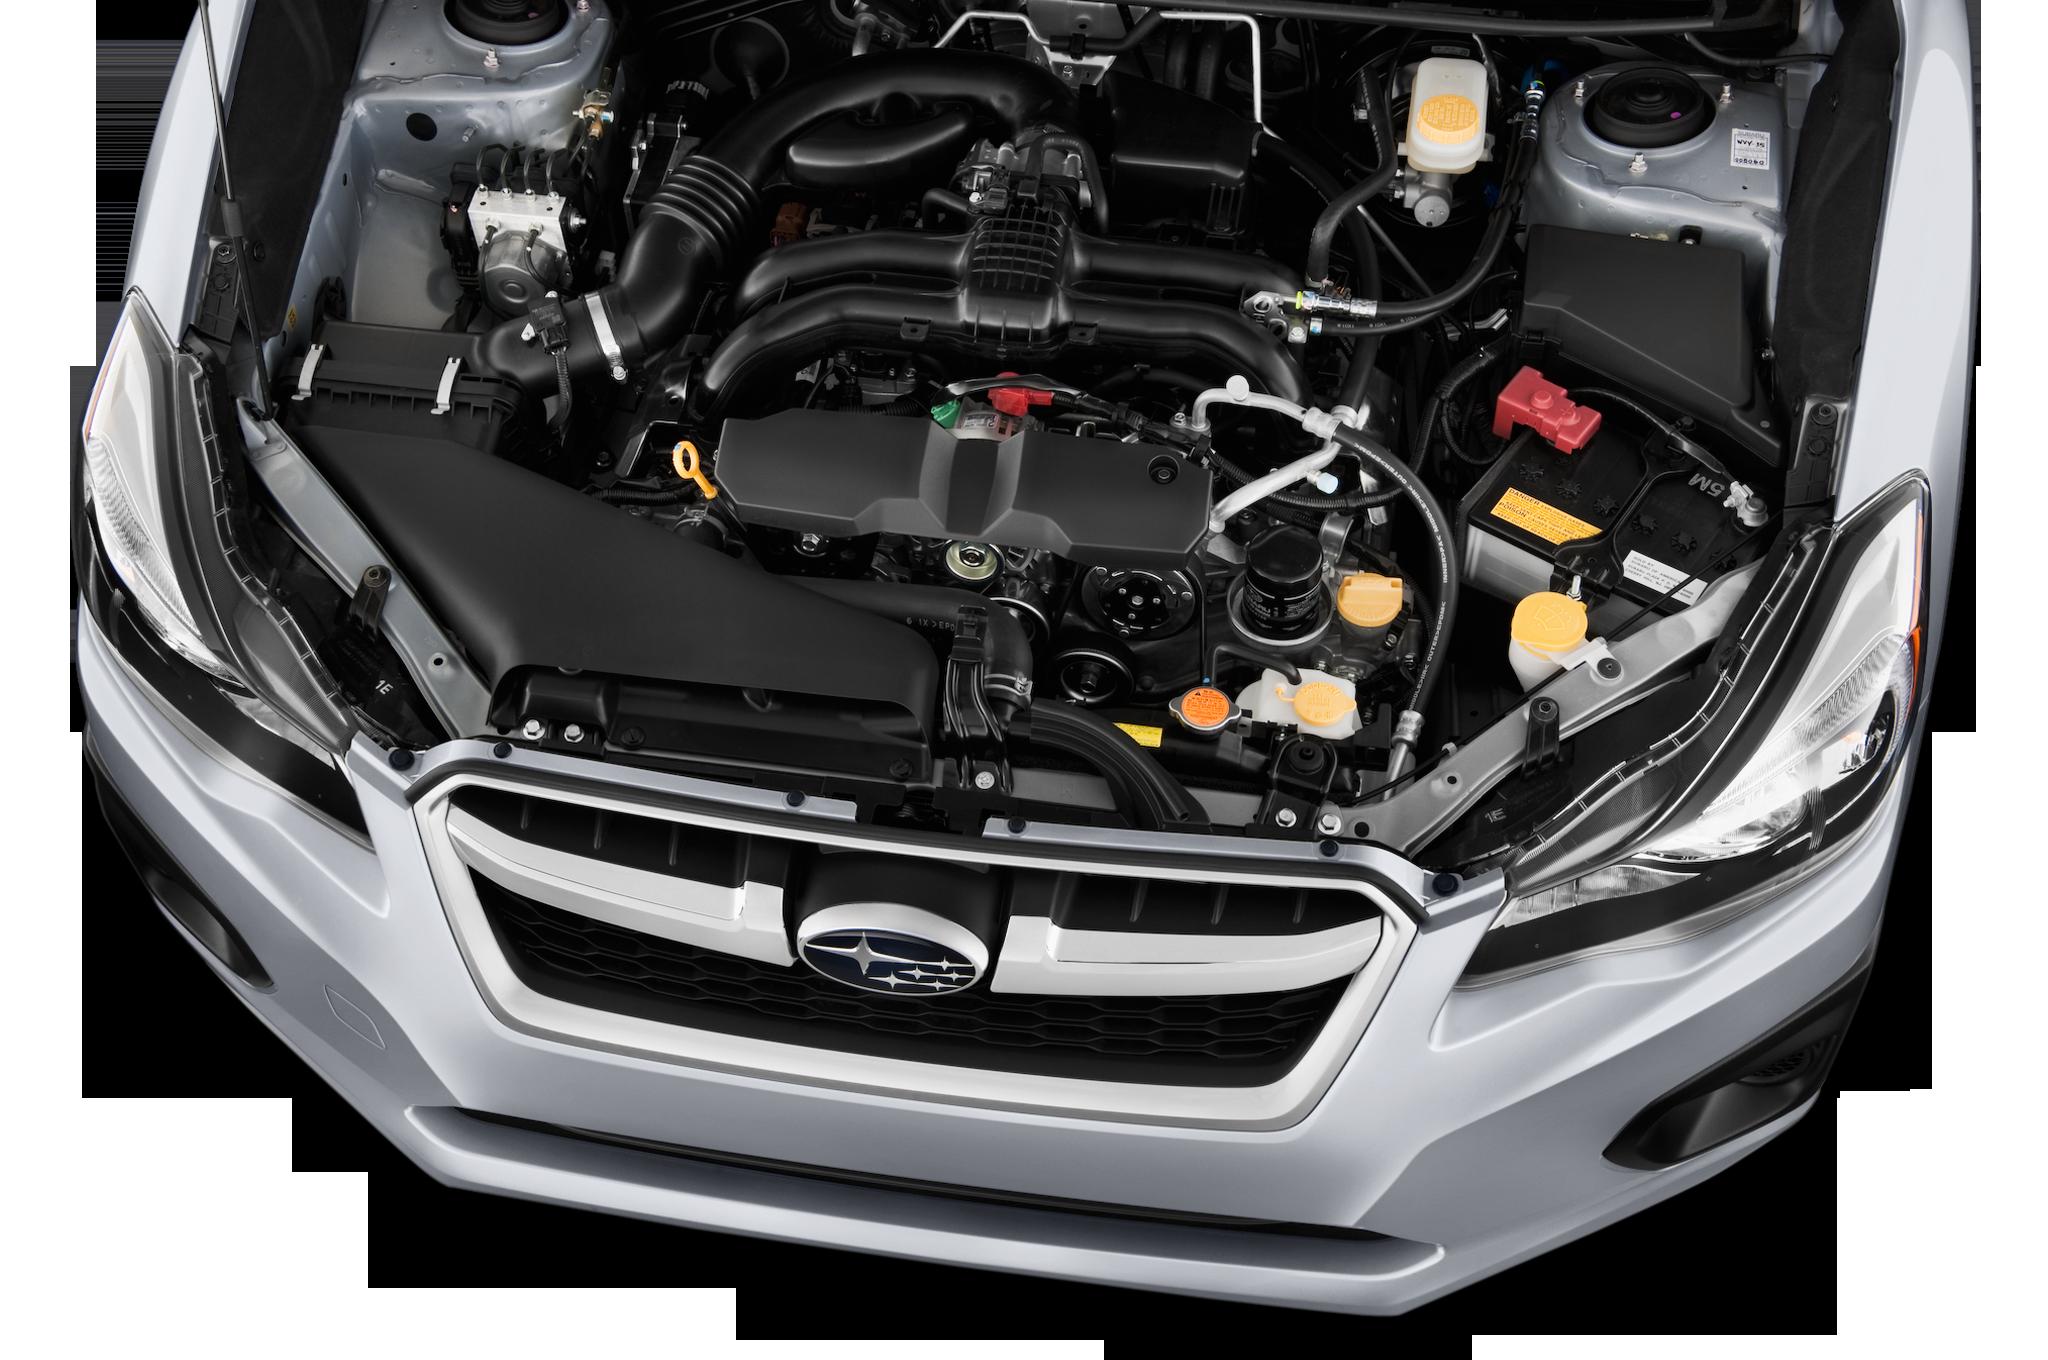 subaru impreza 2 0i engine diagrams example electrical wiring rh cranejapan co 2013 Subaru Impreza Hatchback Limited 2013 Subaru Impreza Hatchback Limited